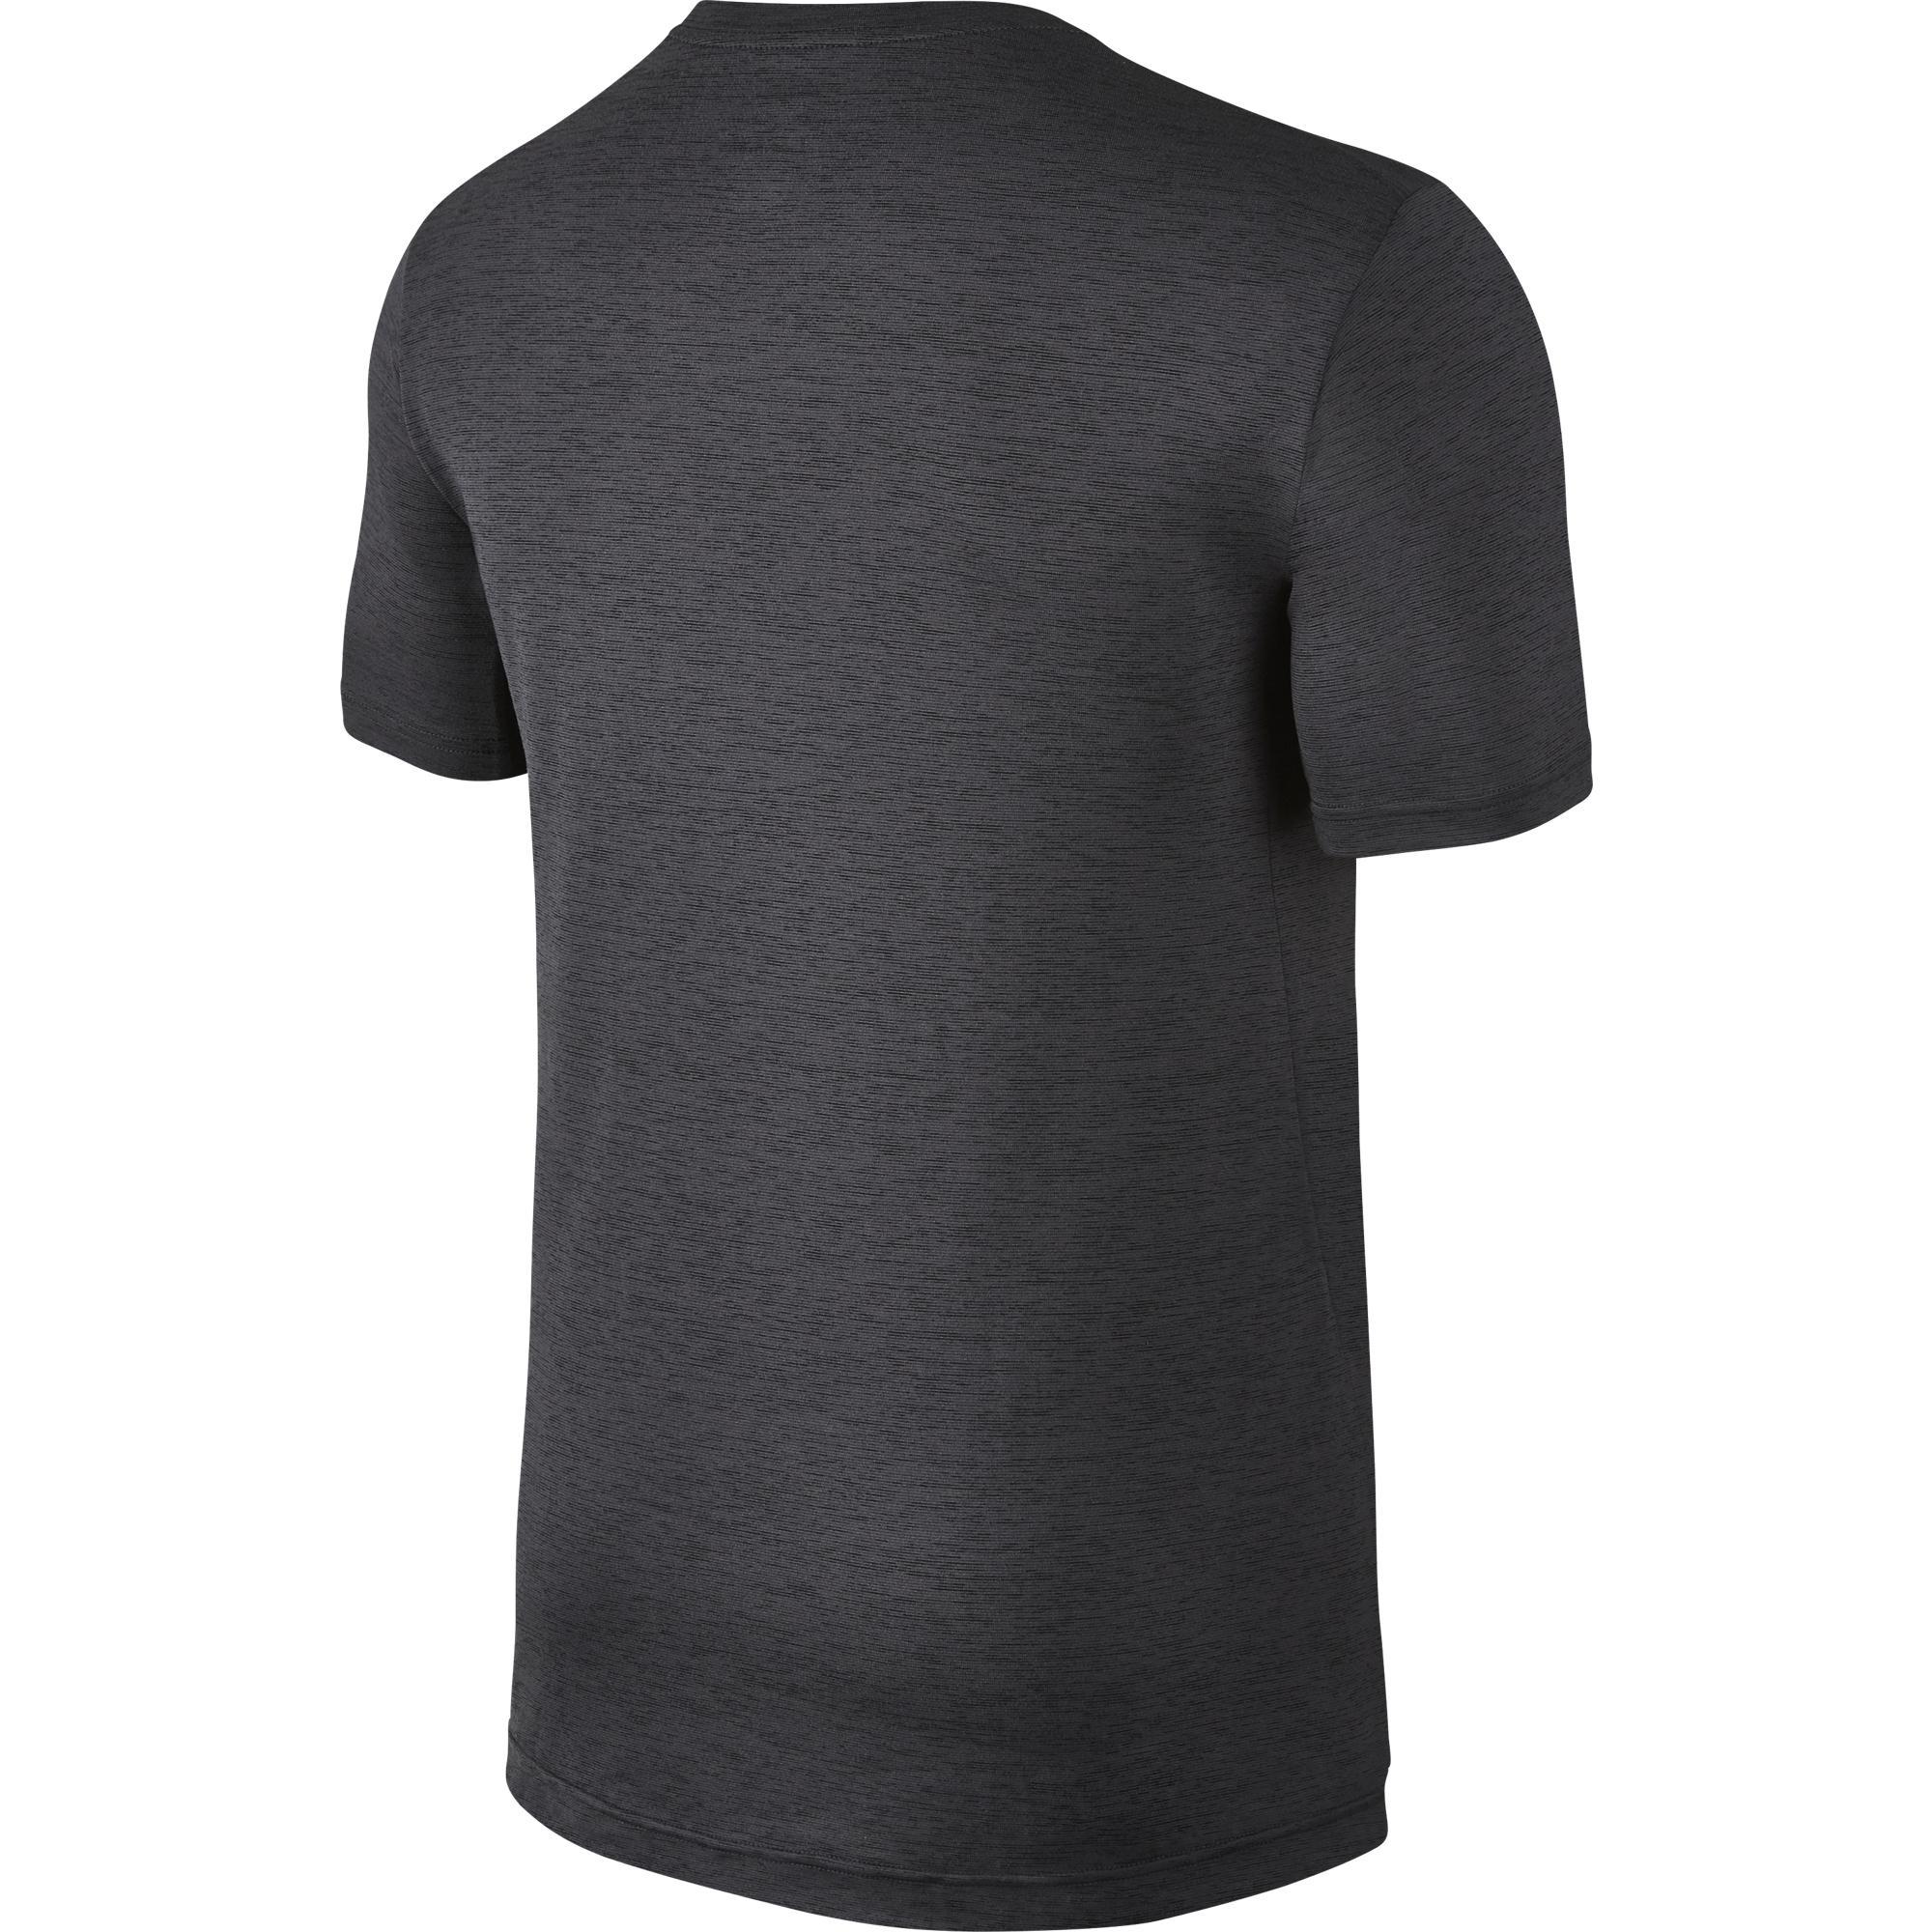 Nike dri fit training ss ss16 erkek ti rt 742228 010 for T shirt printing stonecrest mall